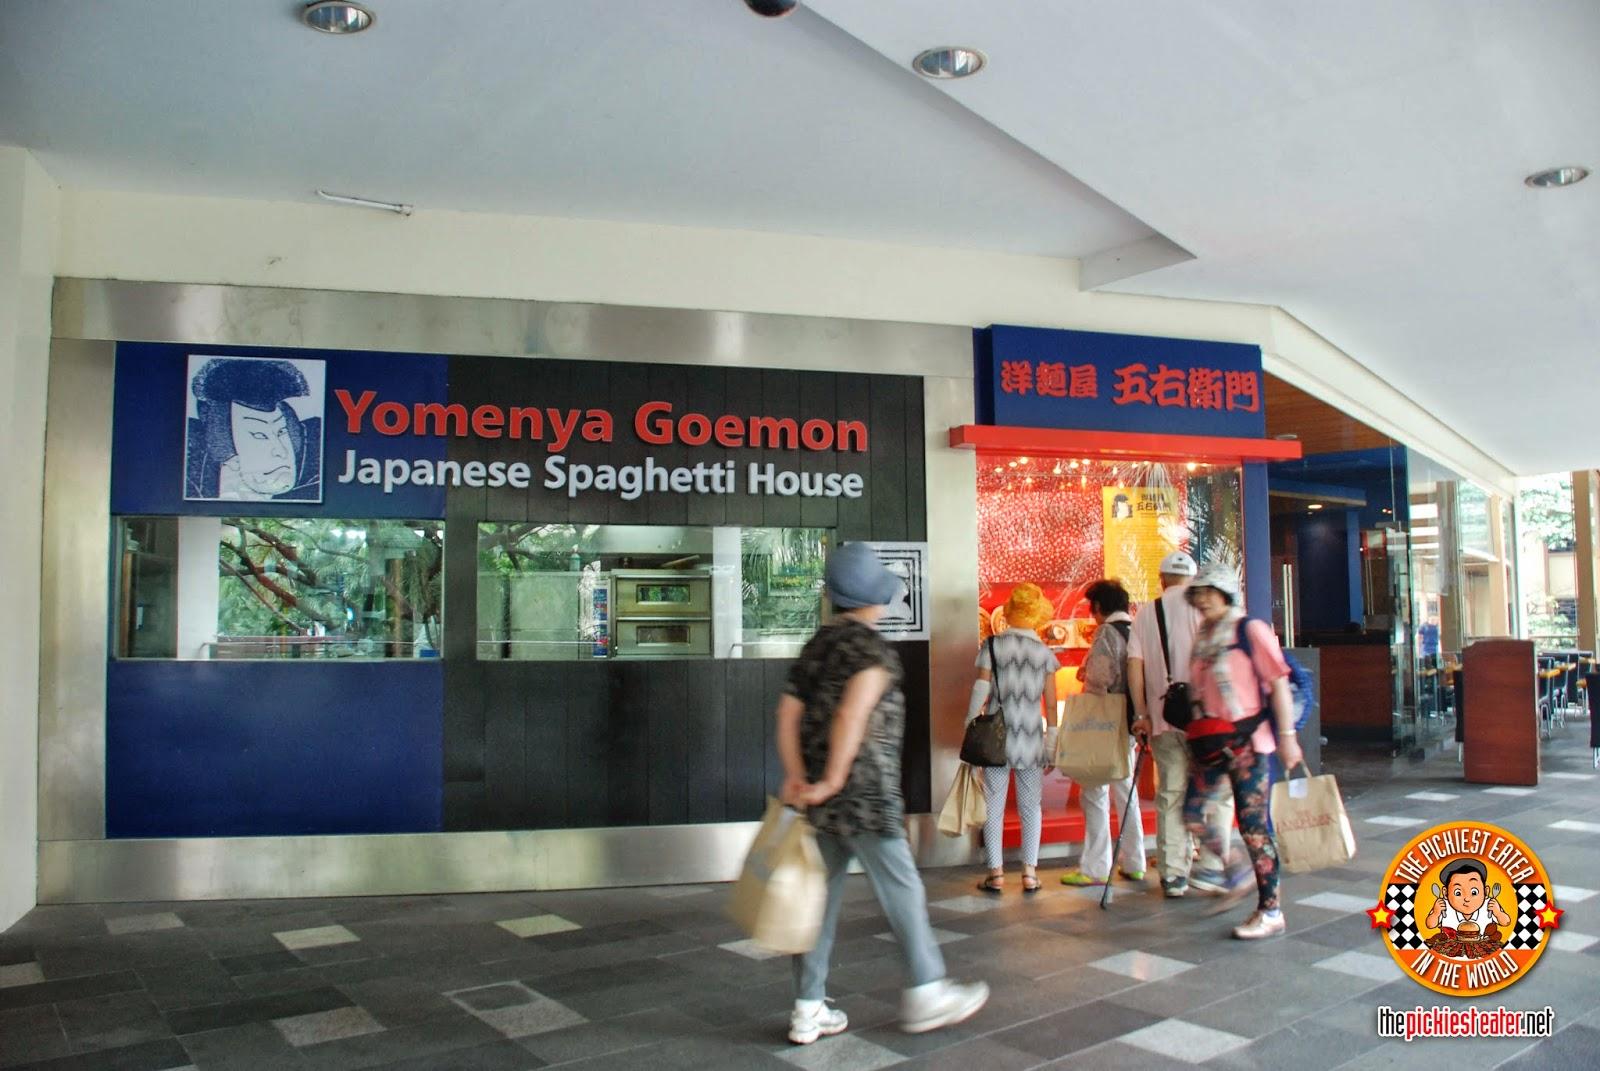 yomenya goemon greenbelt